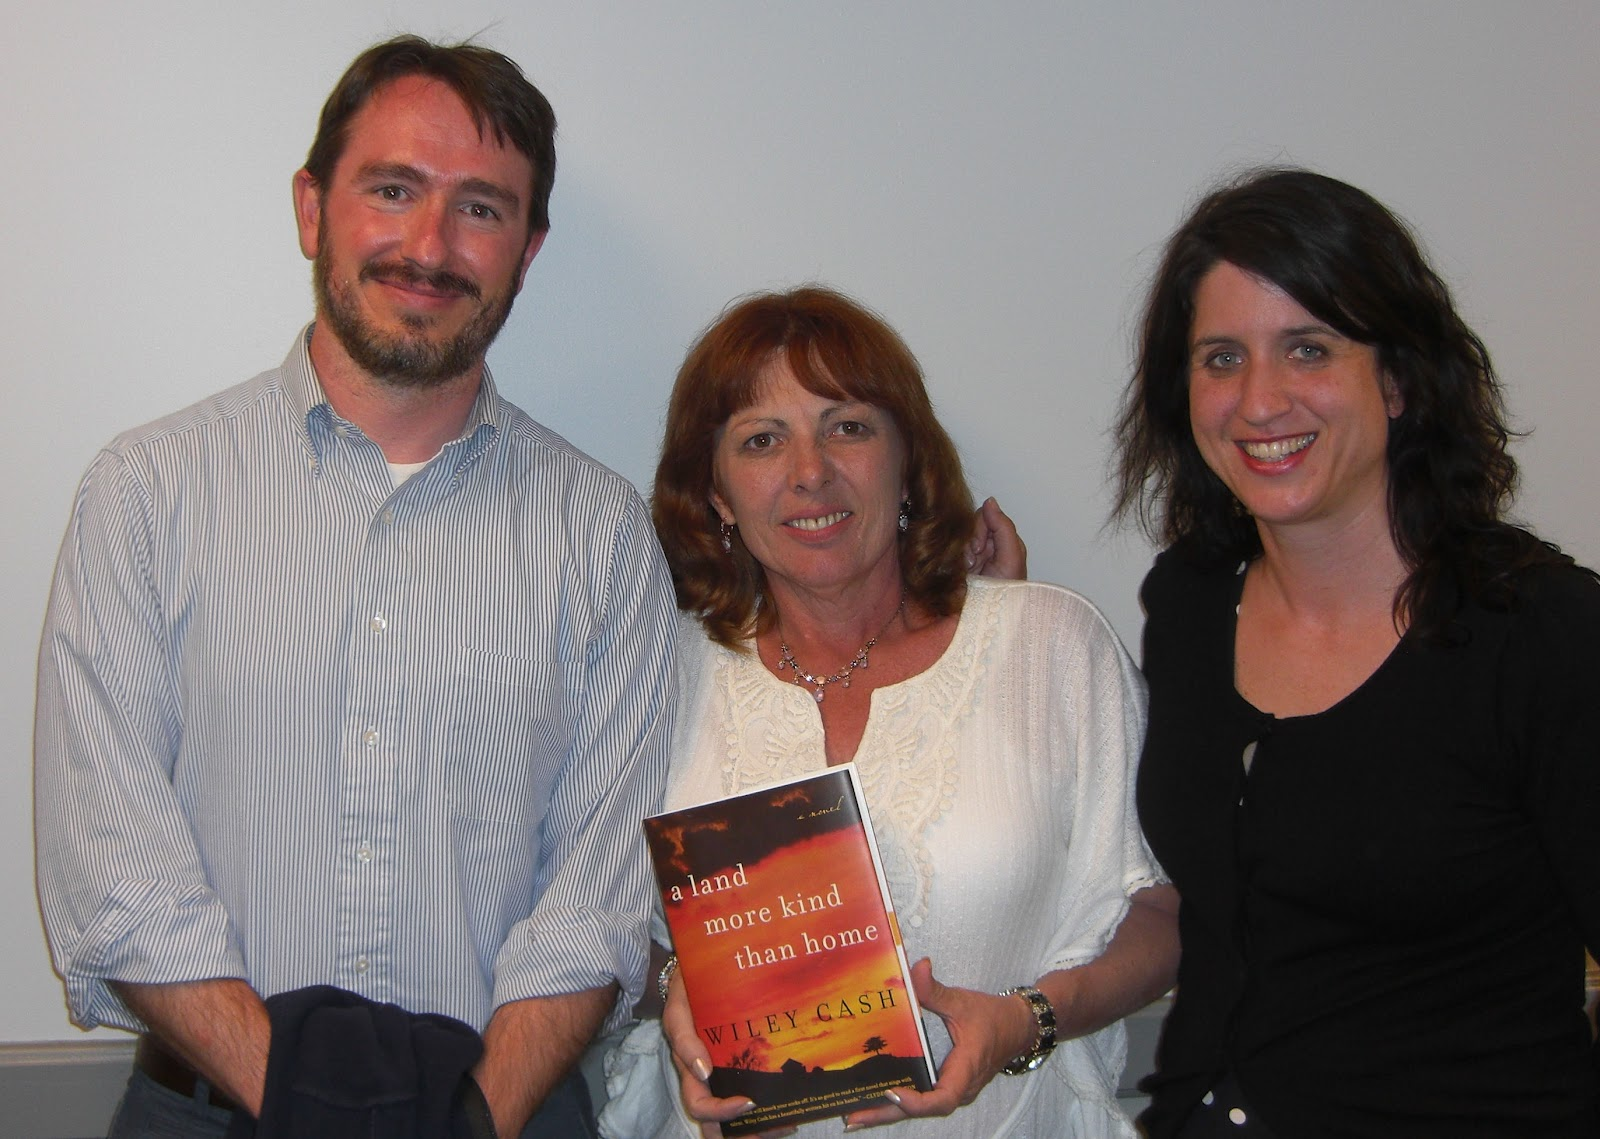 Wiley Cash, Kelly Stone Gamble, And Suzi Shumaker  June 16, 2012